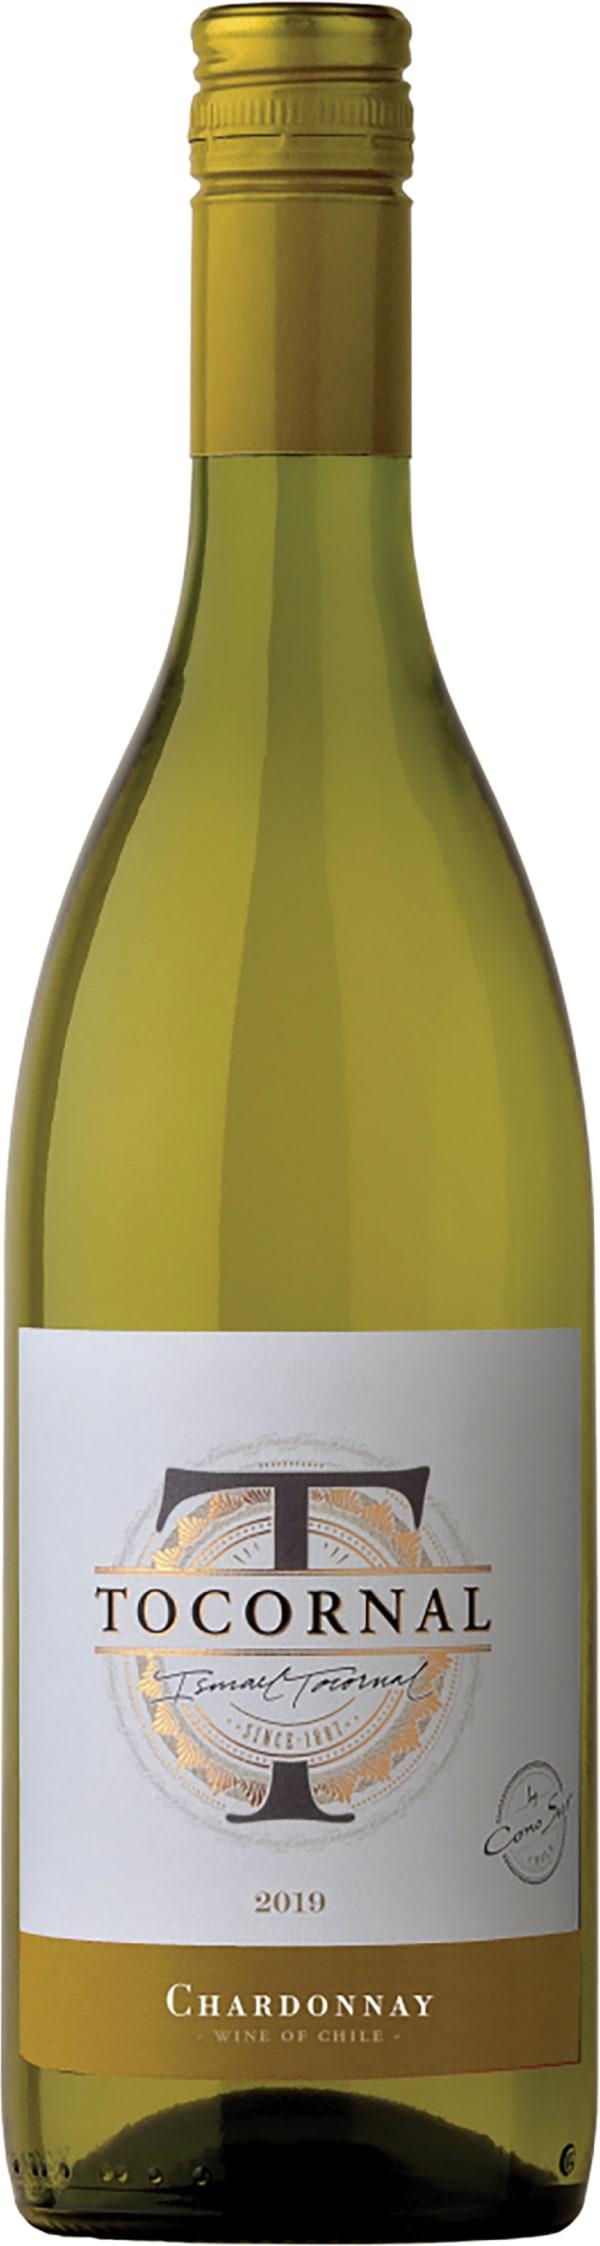 Cono Sur Tocornal Chardonnay 2020